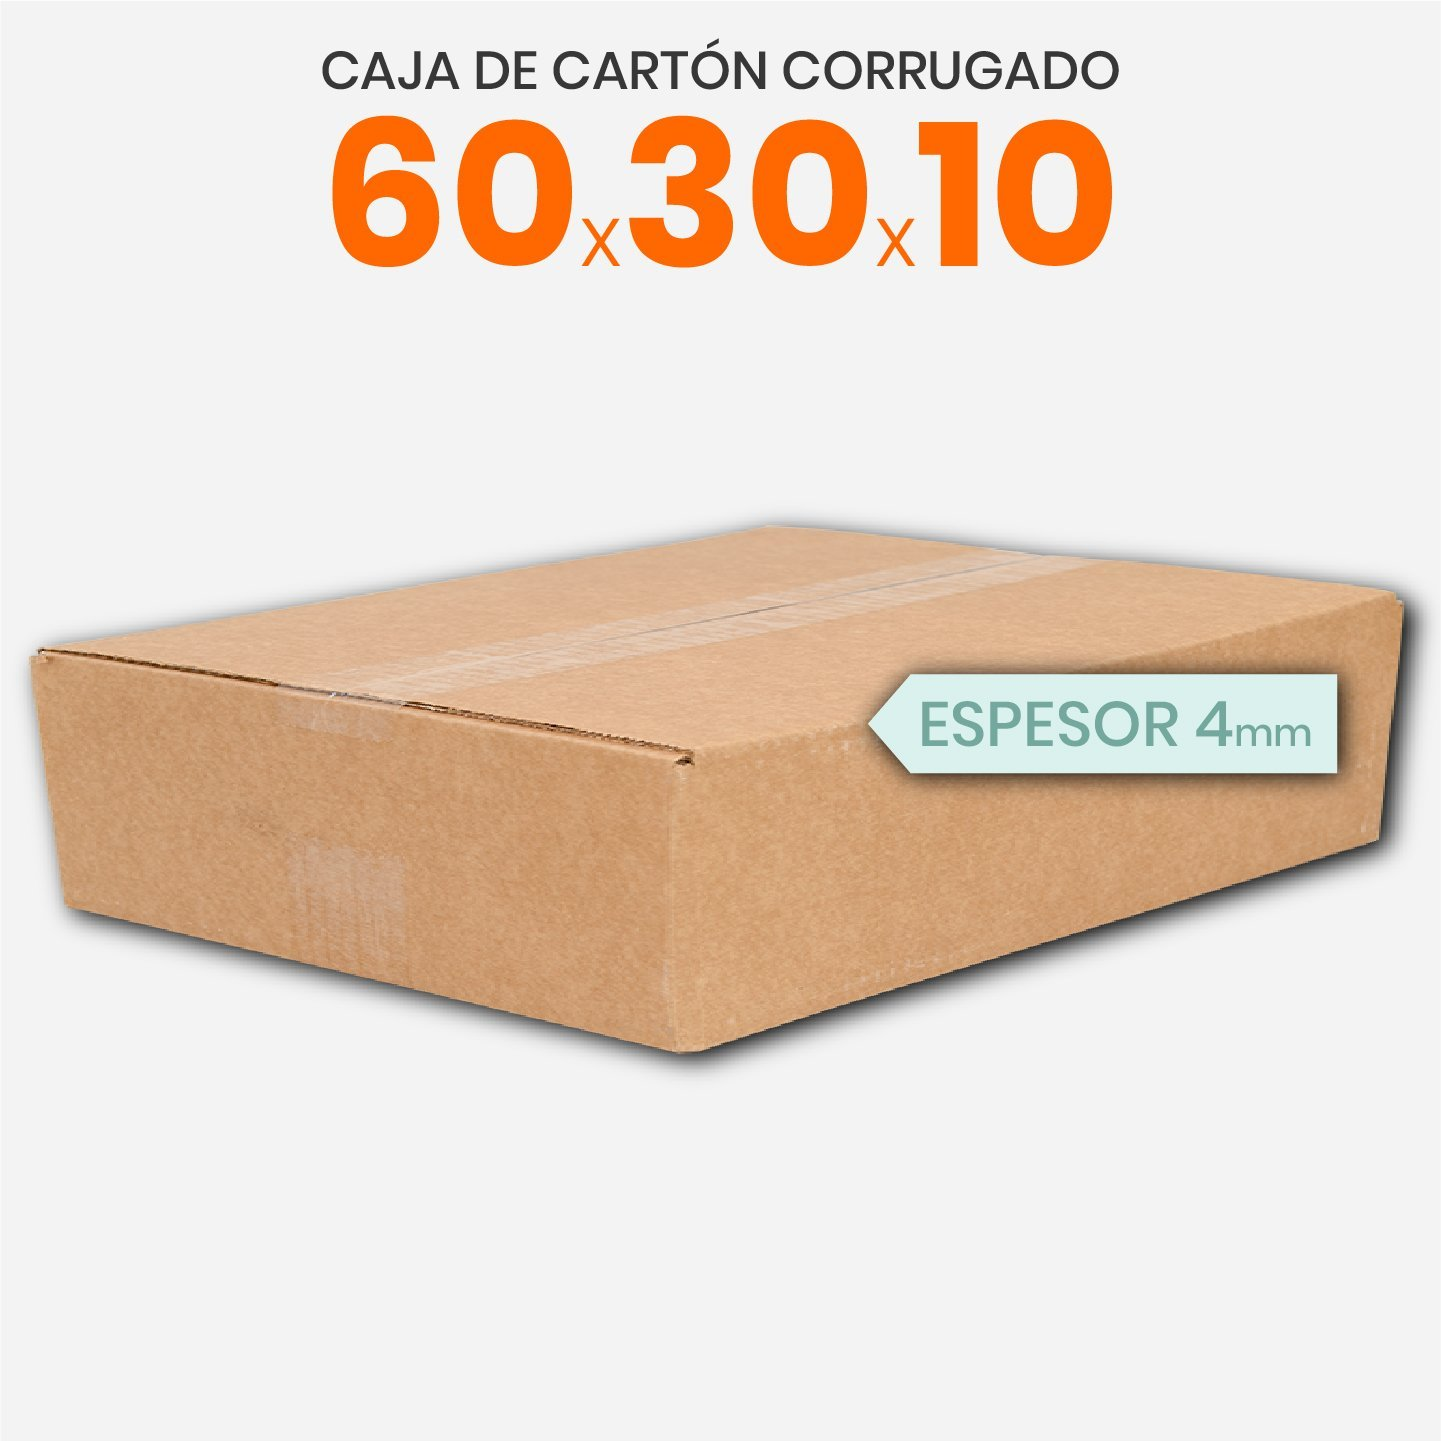 Caja De Cartón Corrugado 60x30x10 4mm